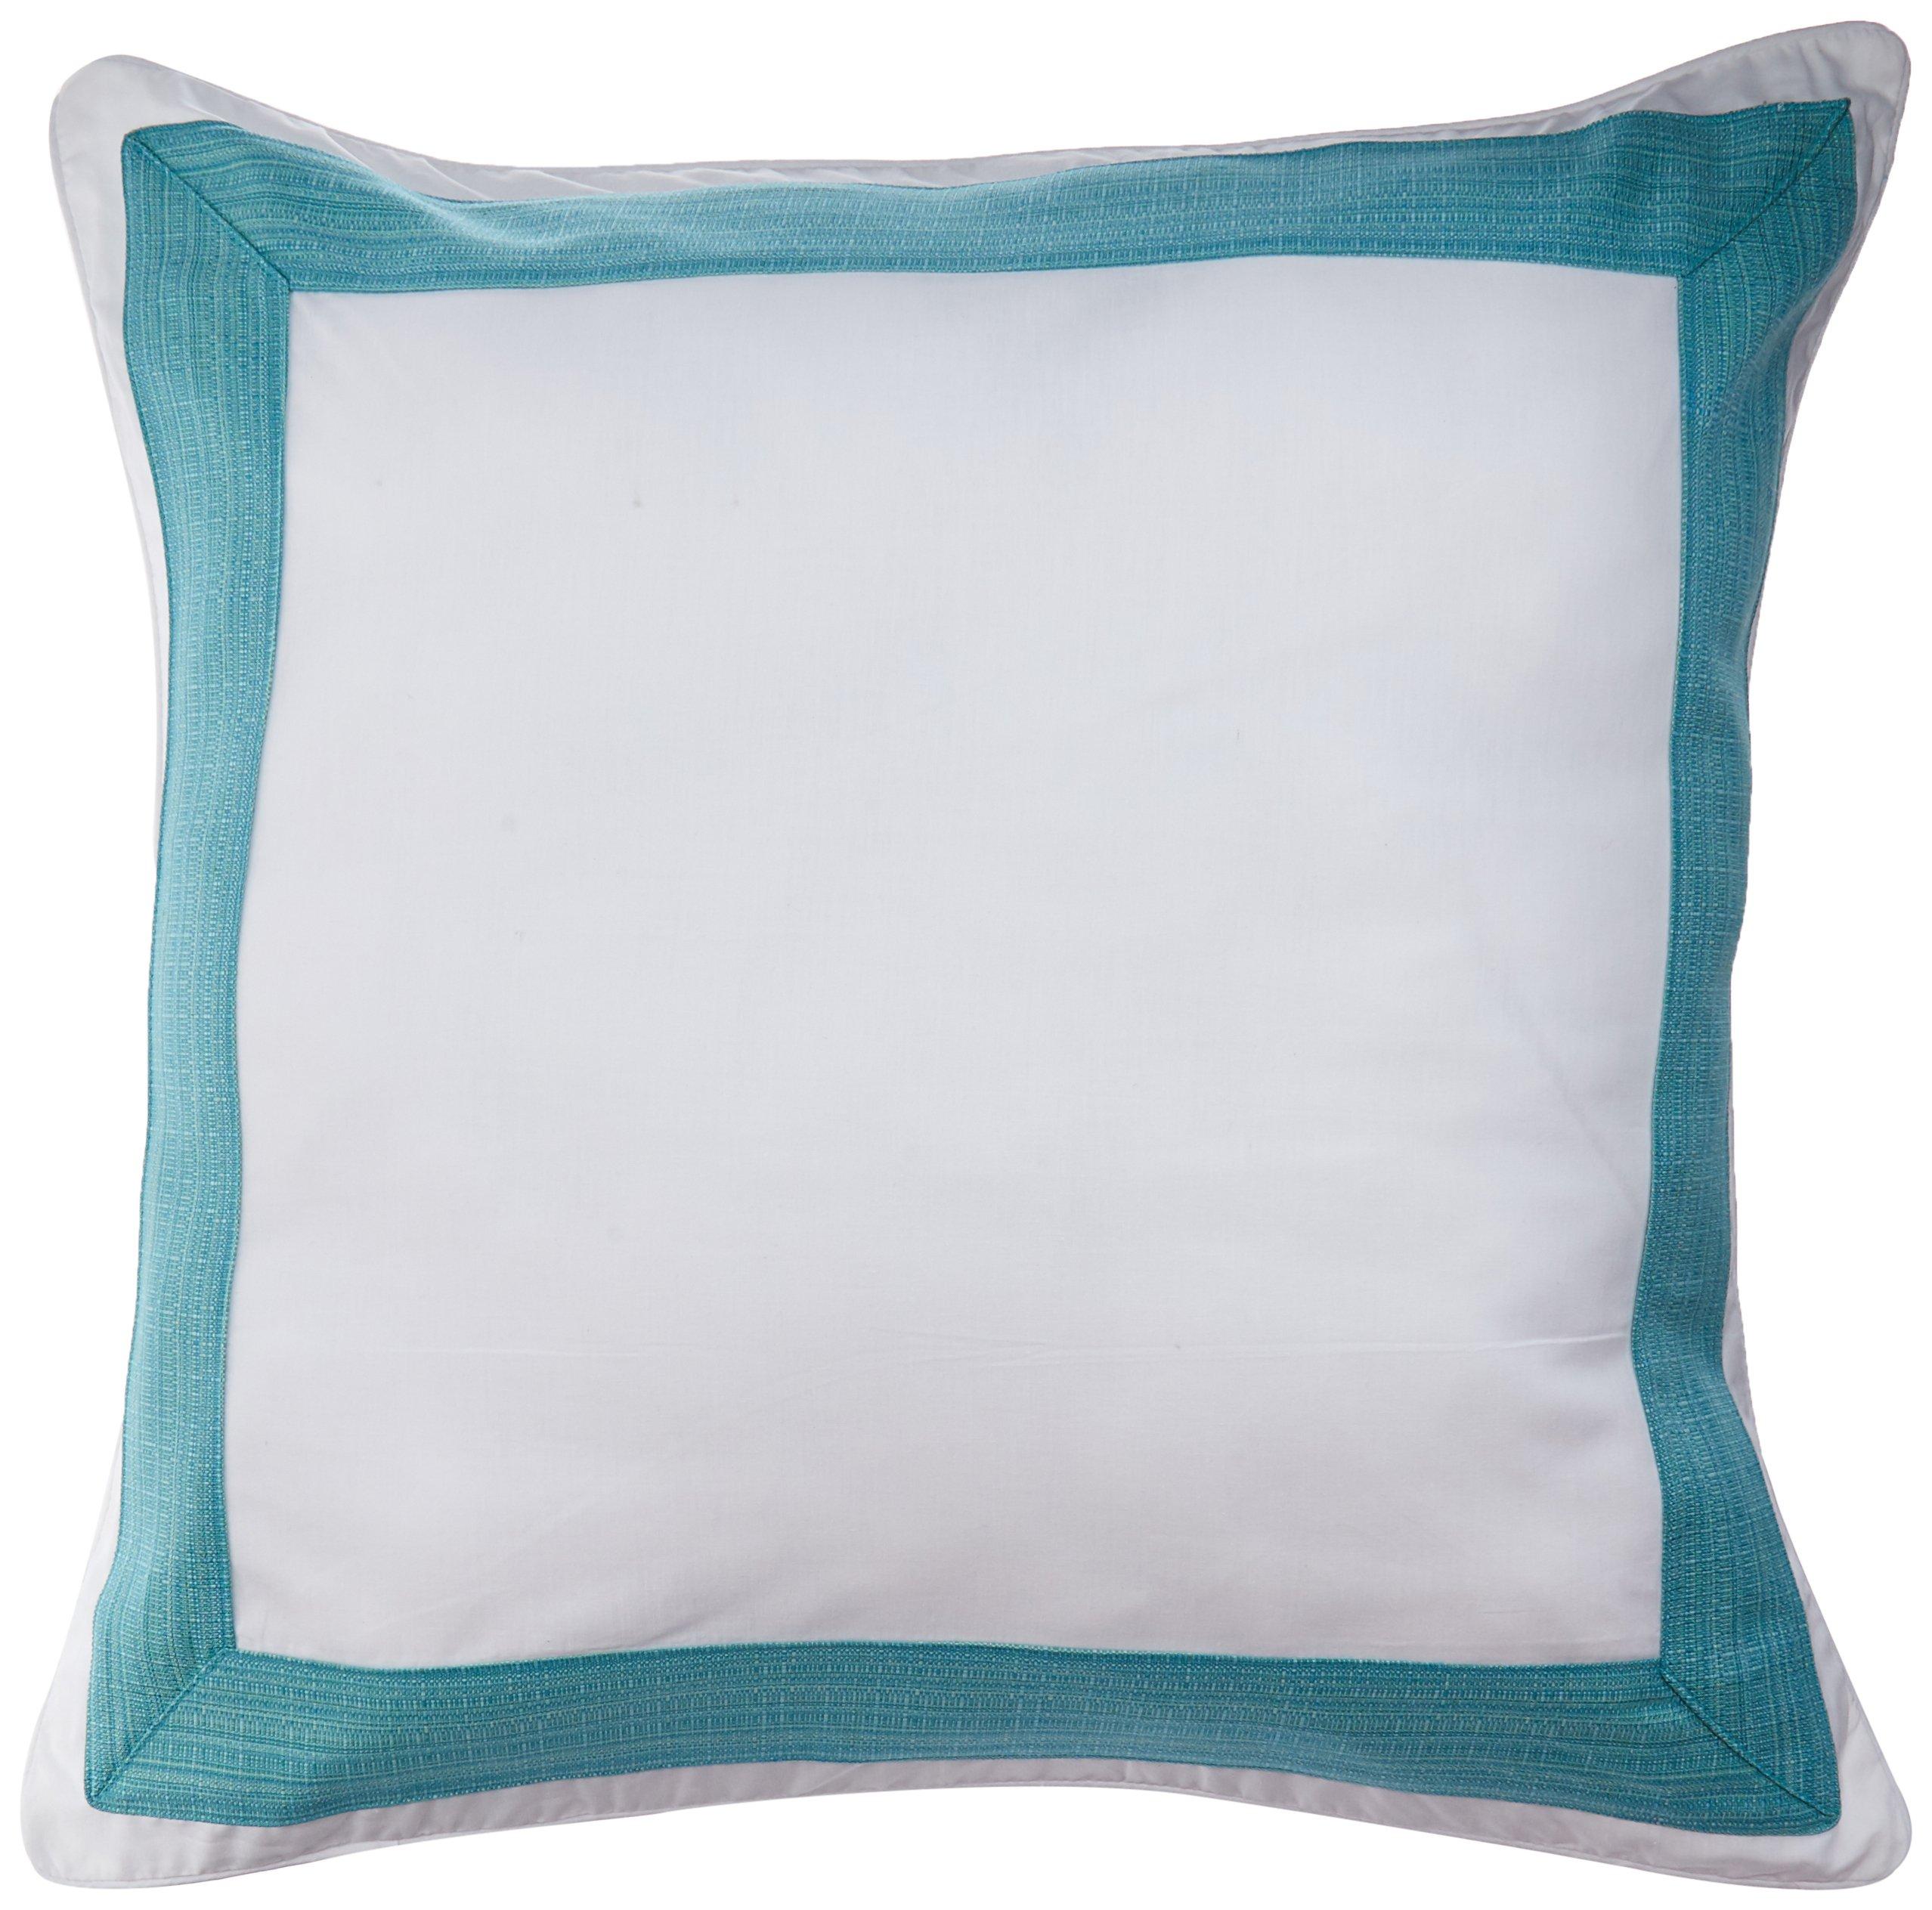 Tommy Bahama La Scala Breezer Comforter Set, Queen, Seaglass by Tommy Bahama (Image #2)